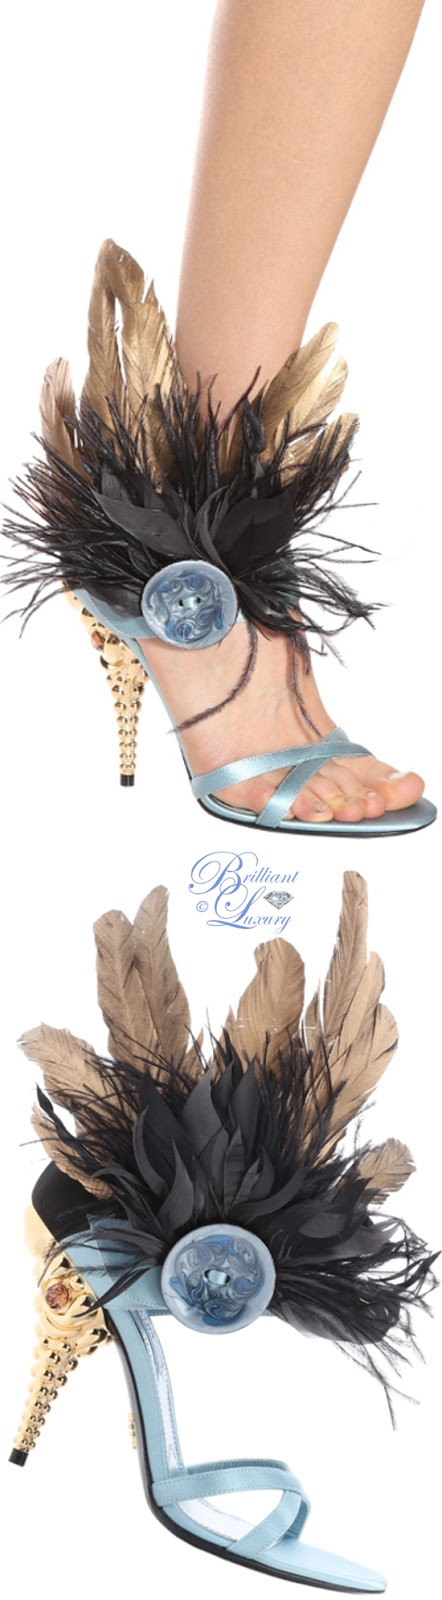 Brilliant Luxury ♦ Prada feather trimmed satin sandals